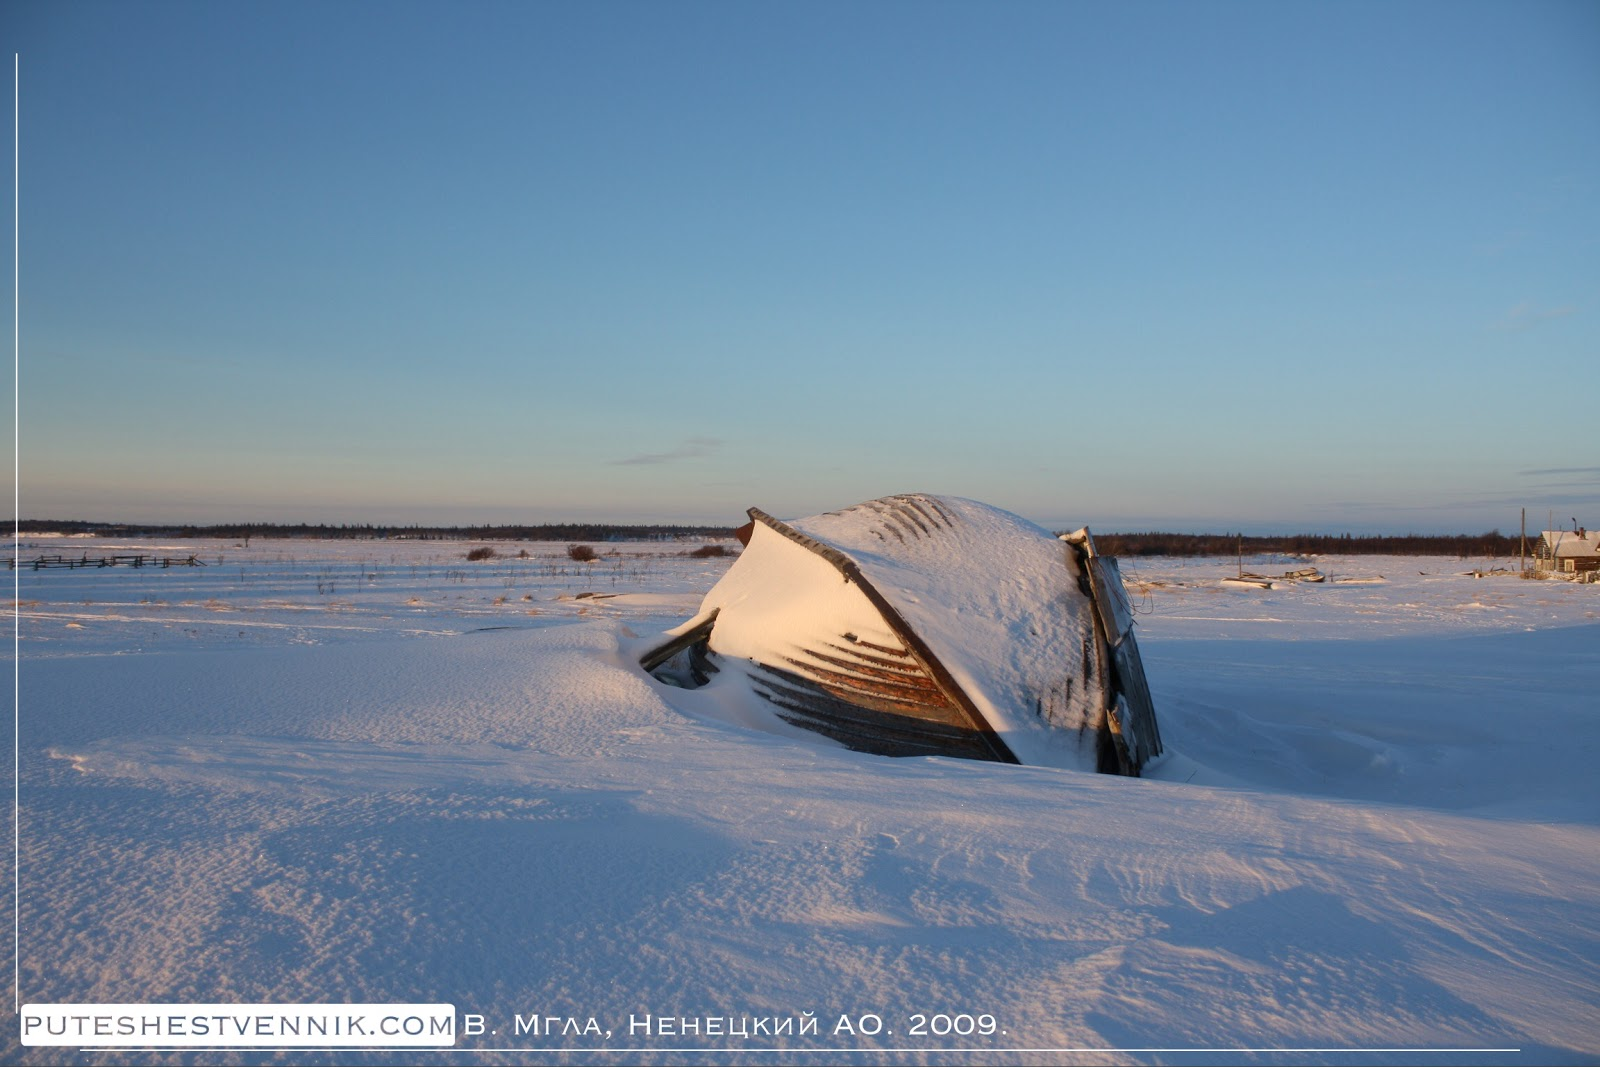 Лодка на снегу в русской деревне